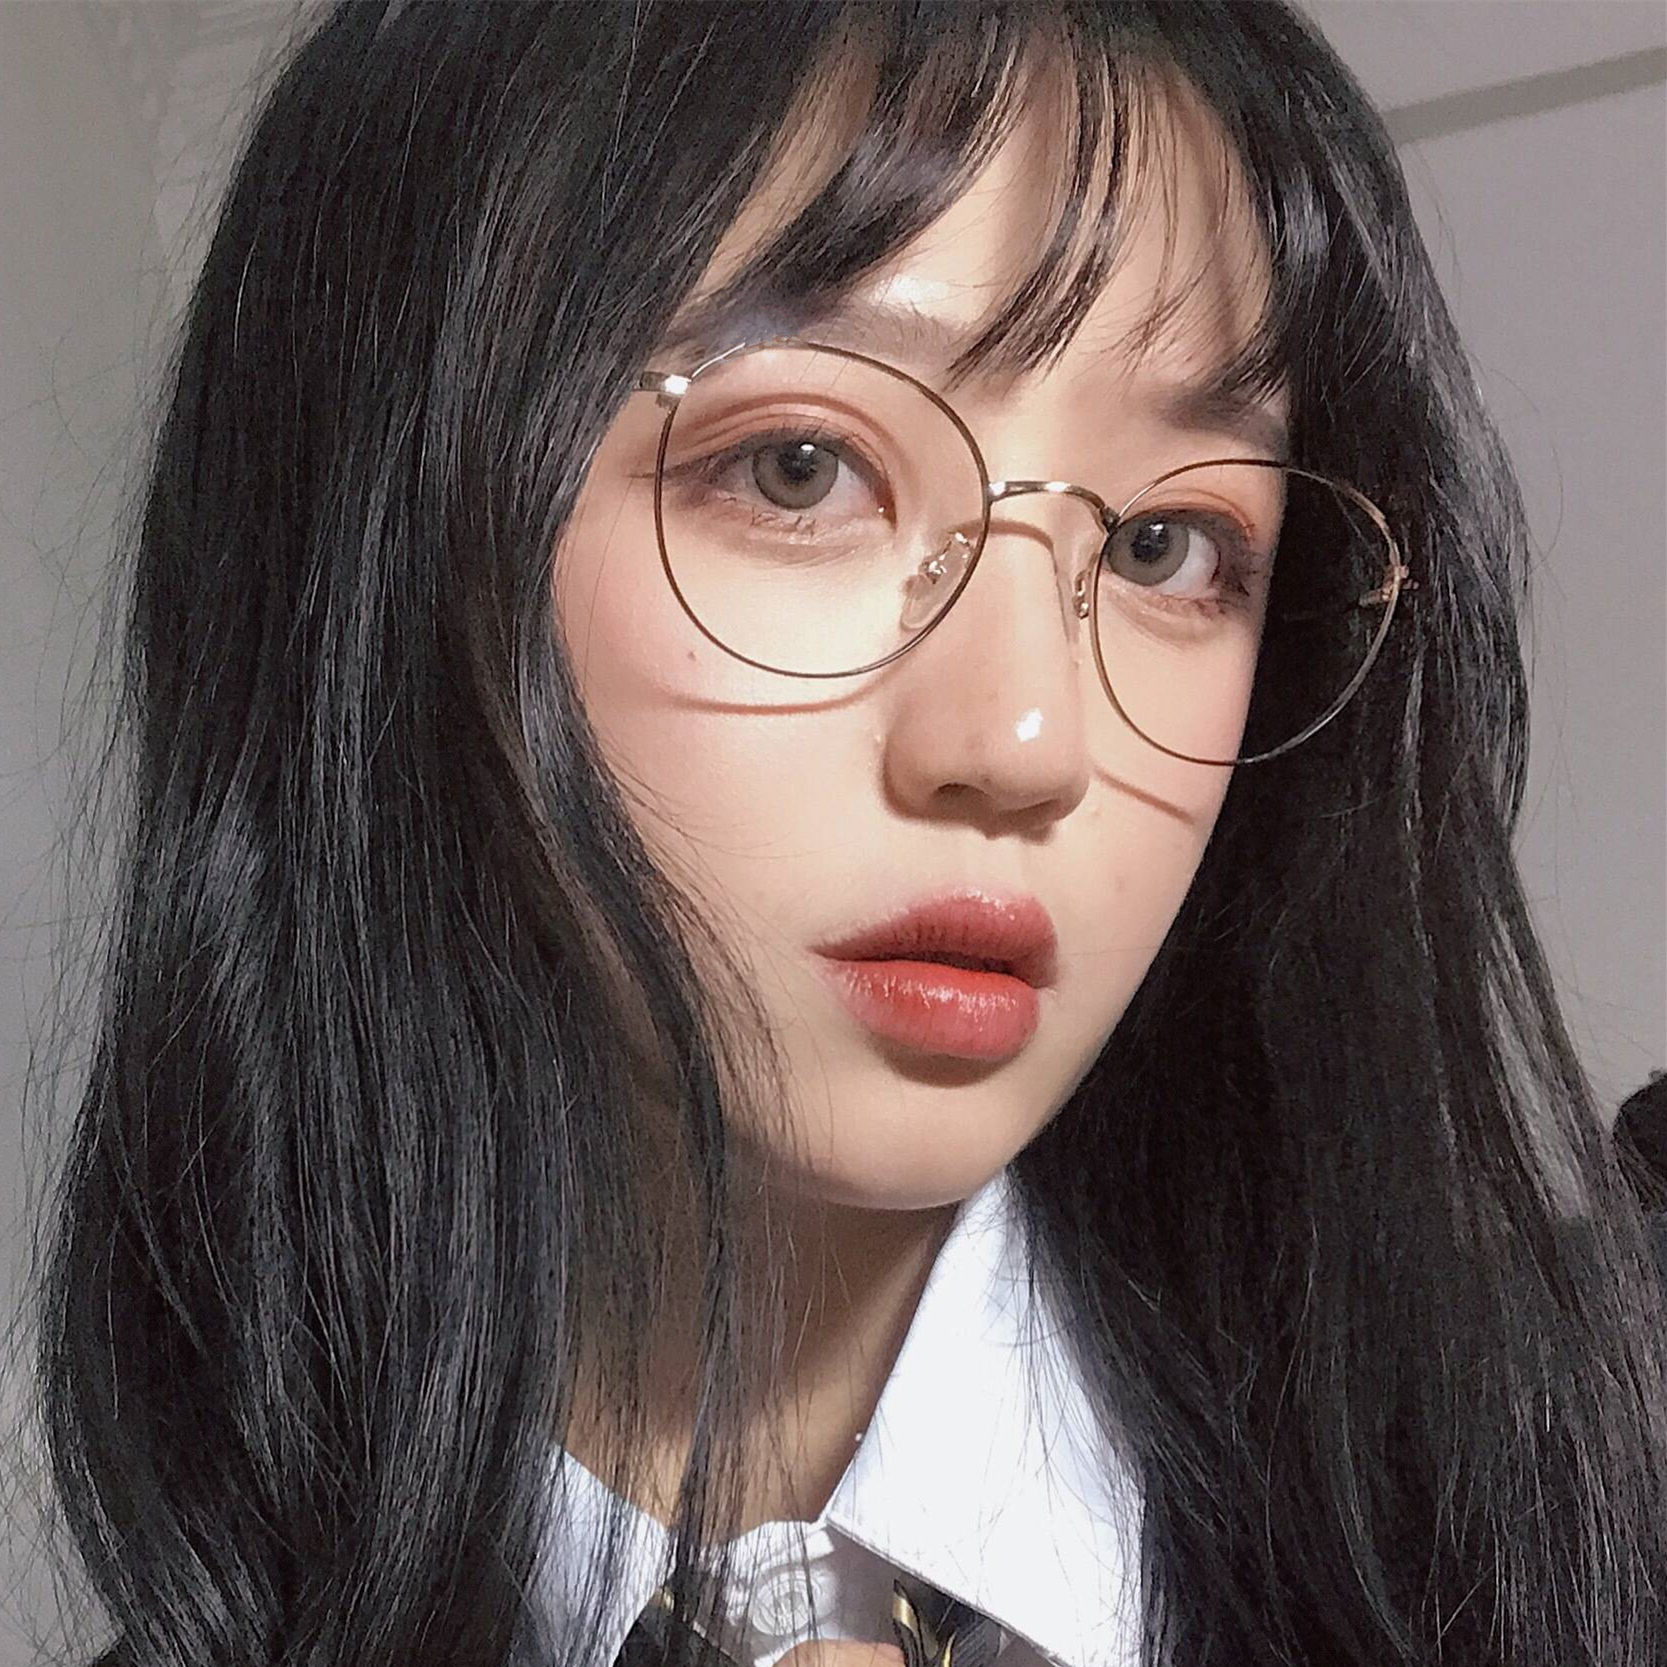 4645478e53 Korean version of the retro retro Harajuku style ulzzang glasses frame  female round face plain face